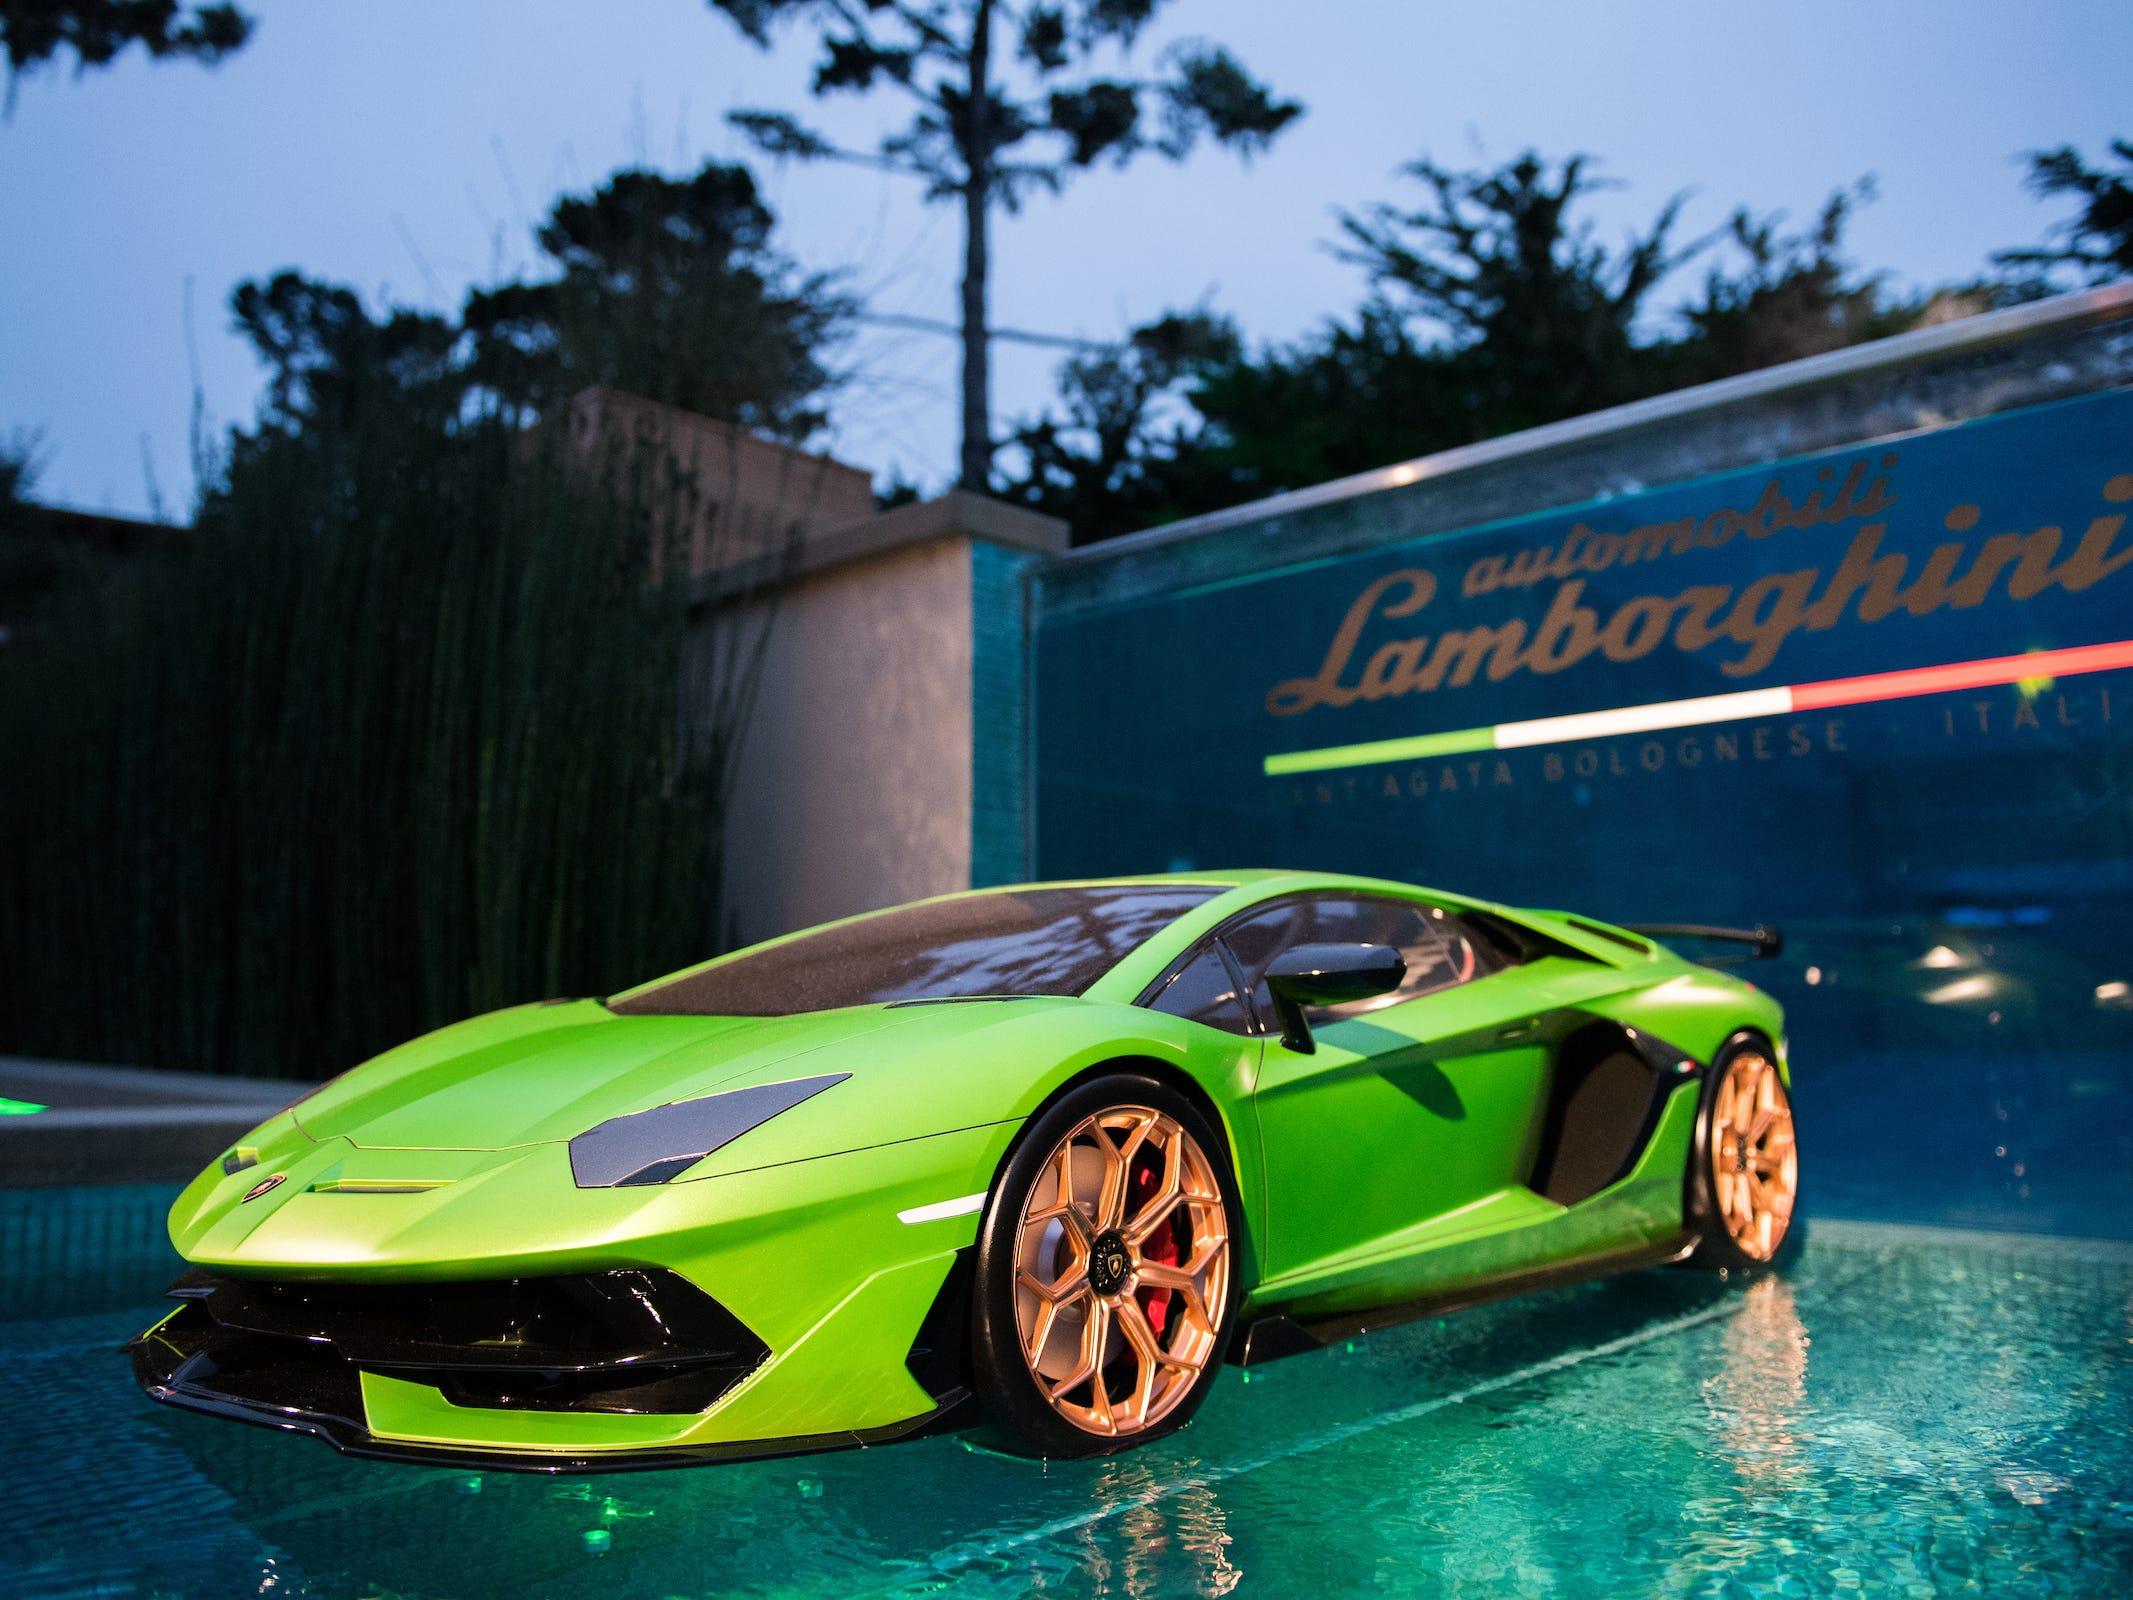 Lamborghini  Aventador SVJ on display at Lamborghini Lounge Monterey